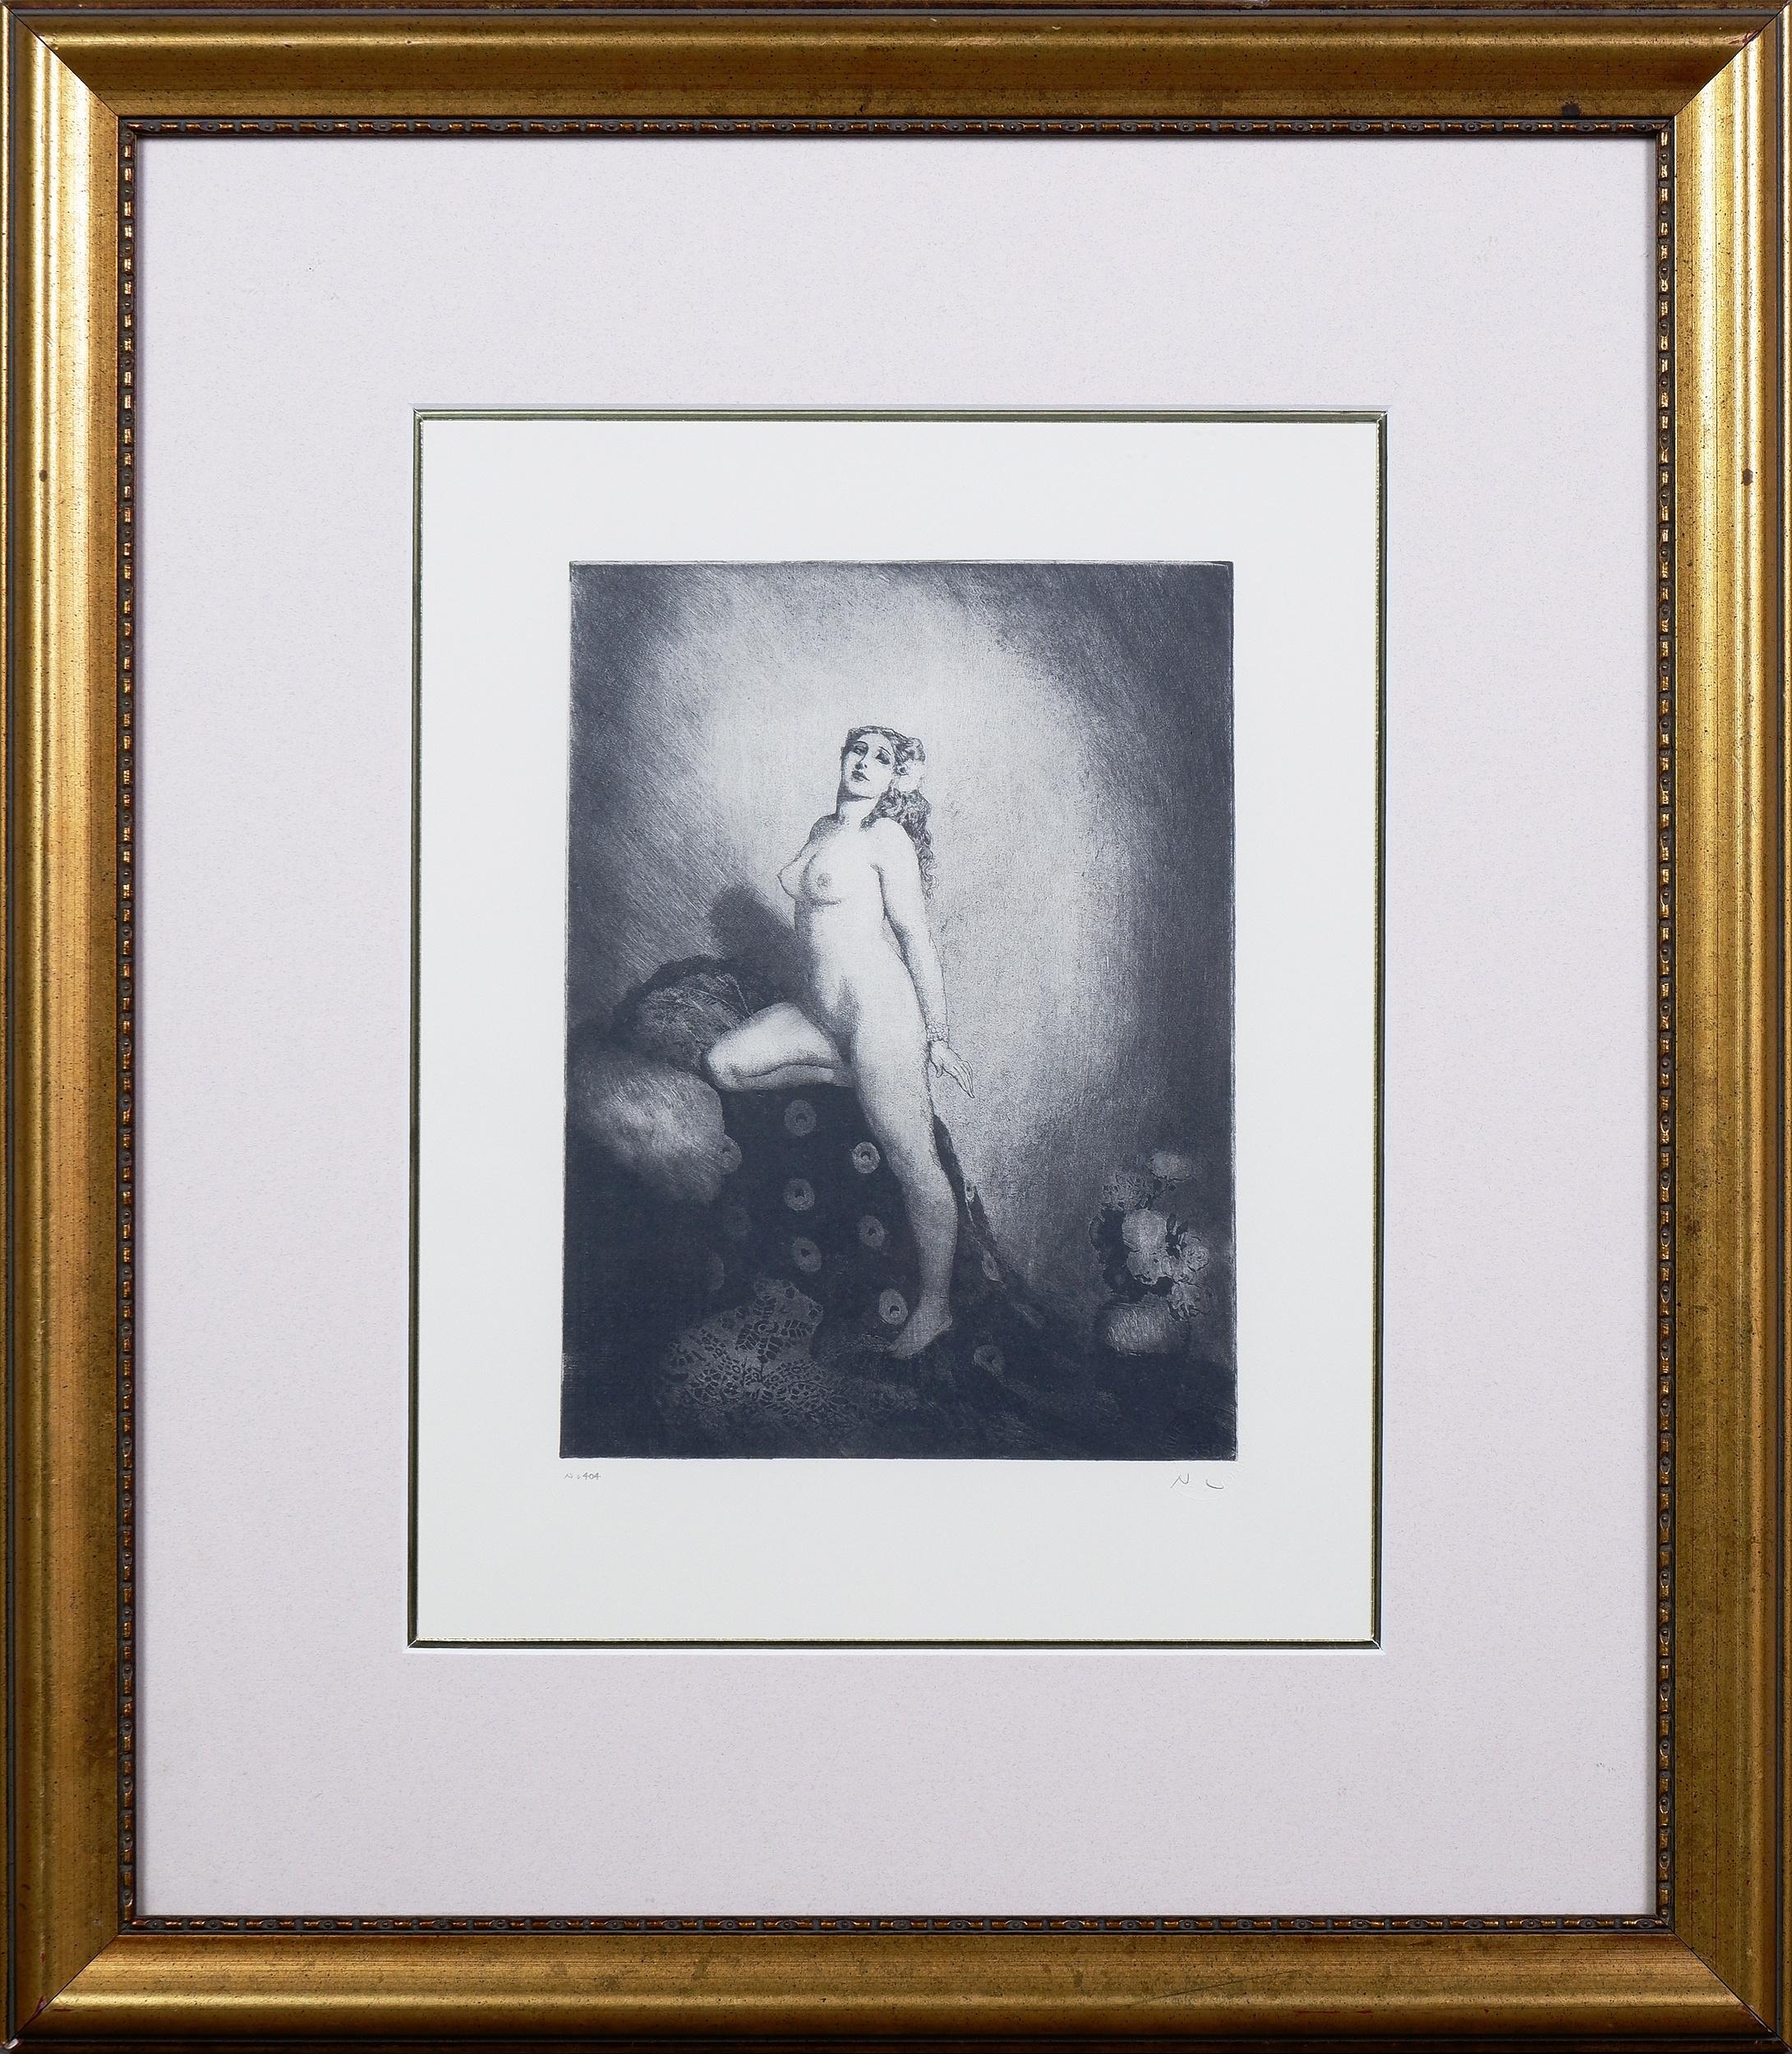 'Norman Lindsay (1879-1969), Memories, Facsimilie Etching'